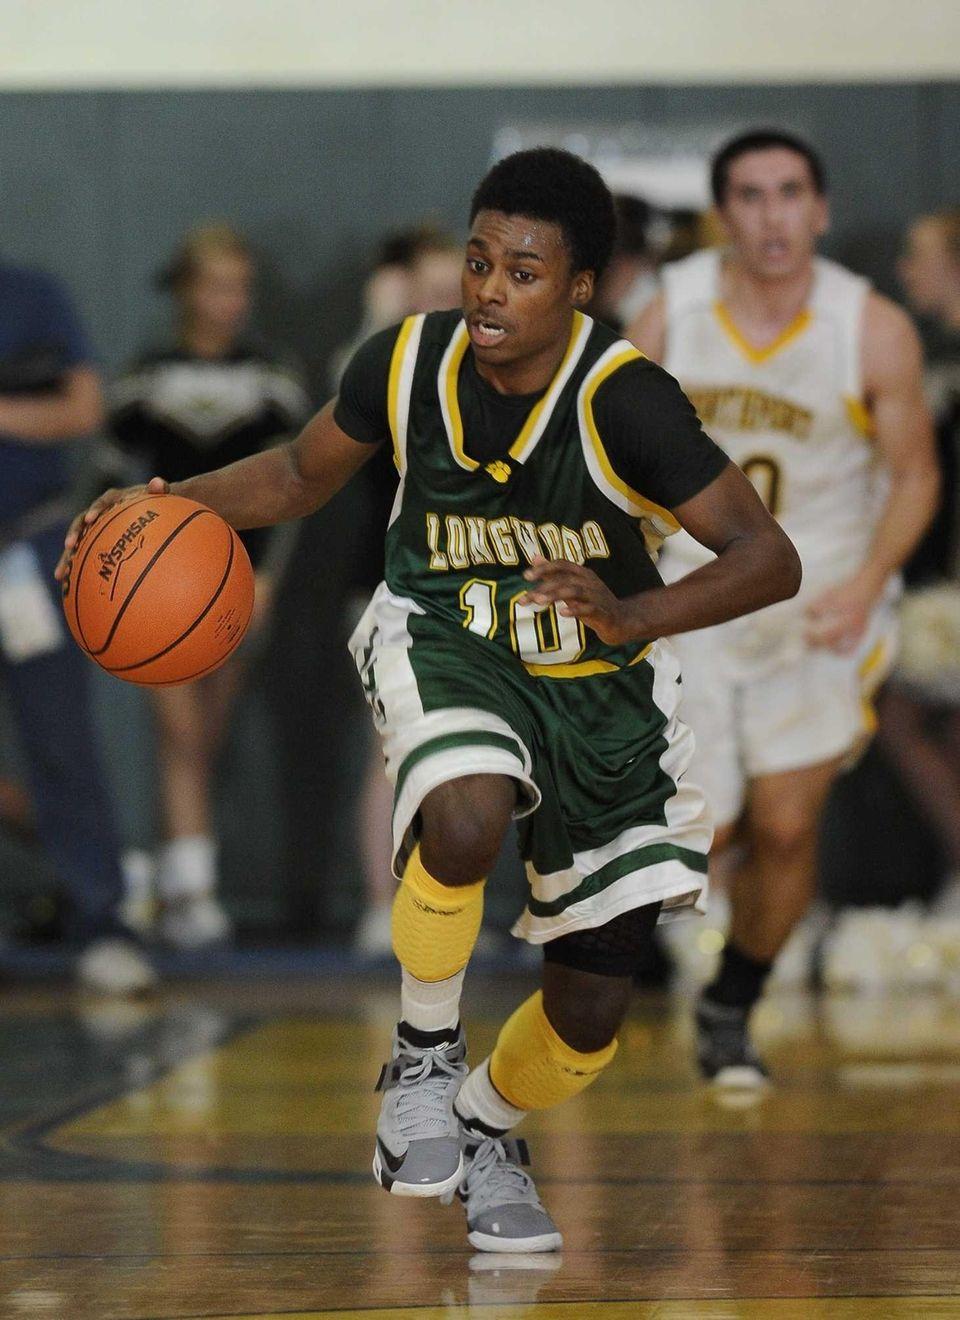 Longwood's Latrell Washington breaks away against Northport in